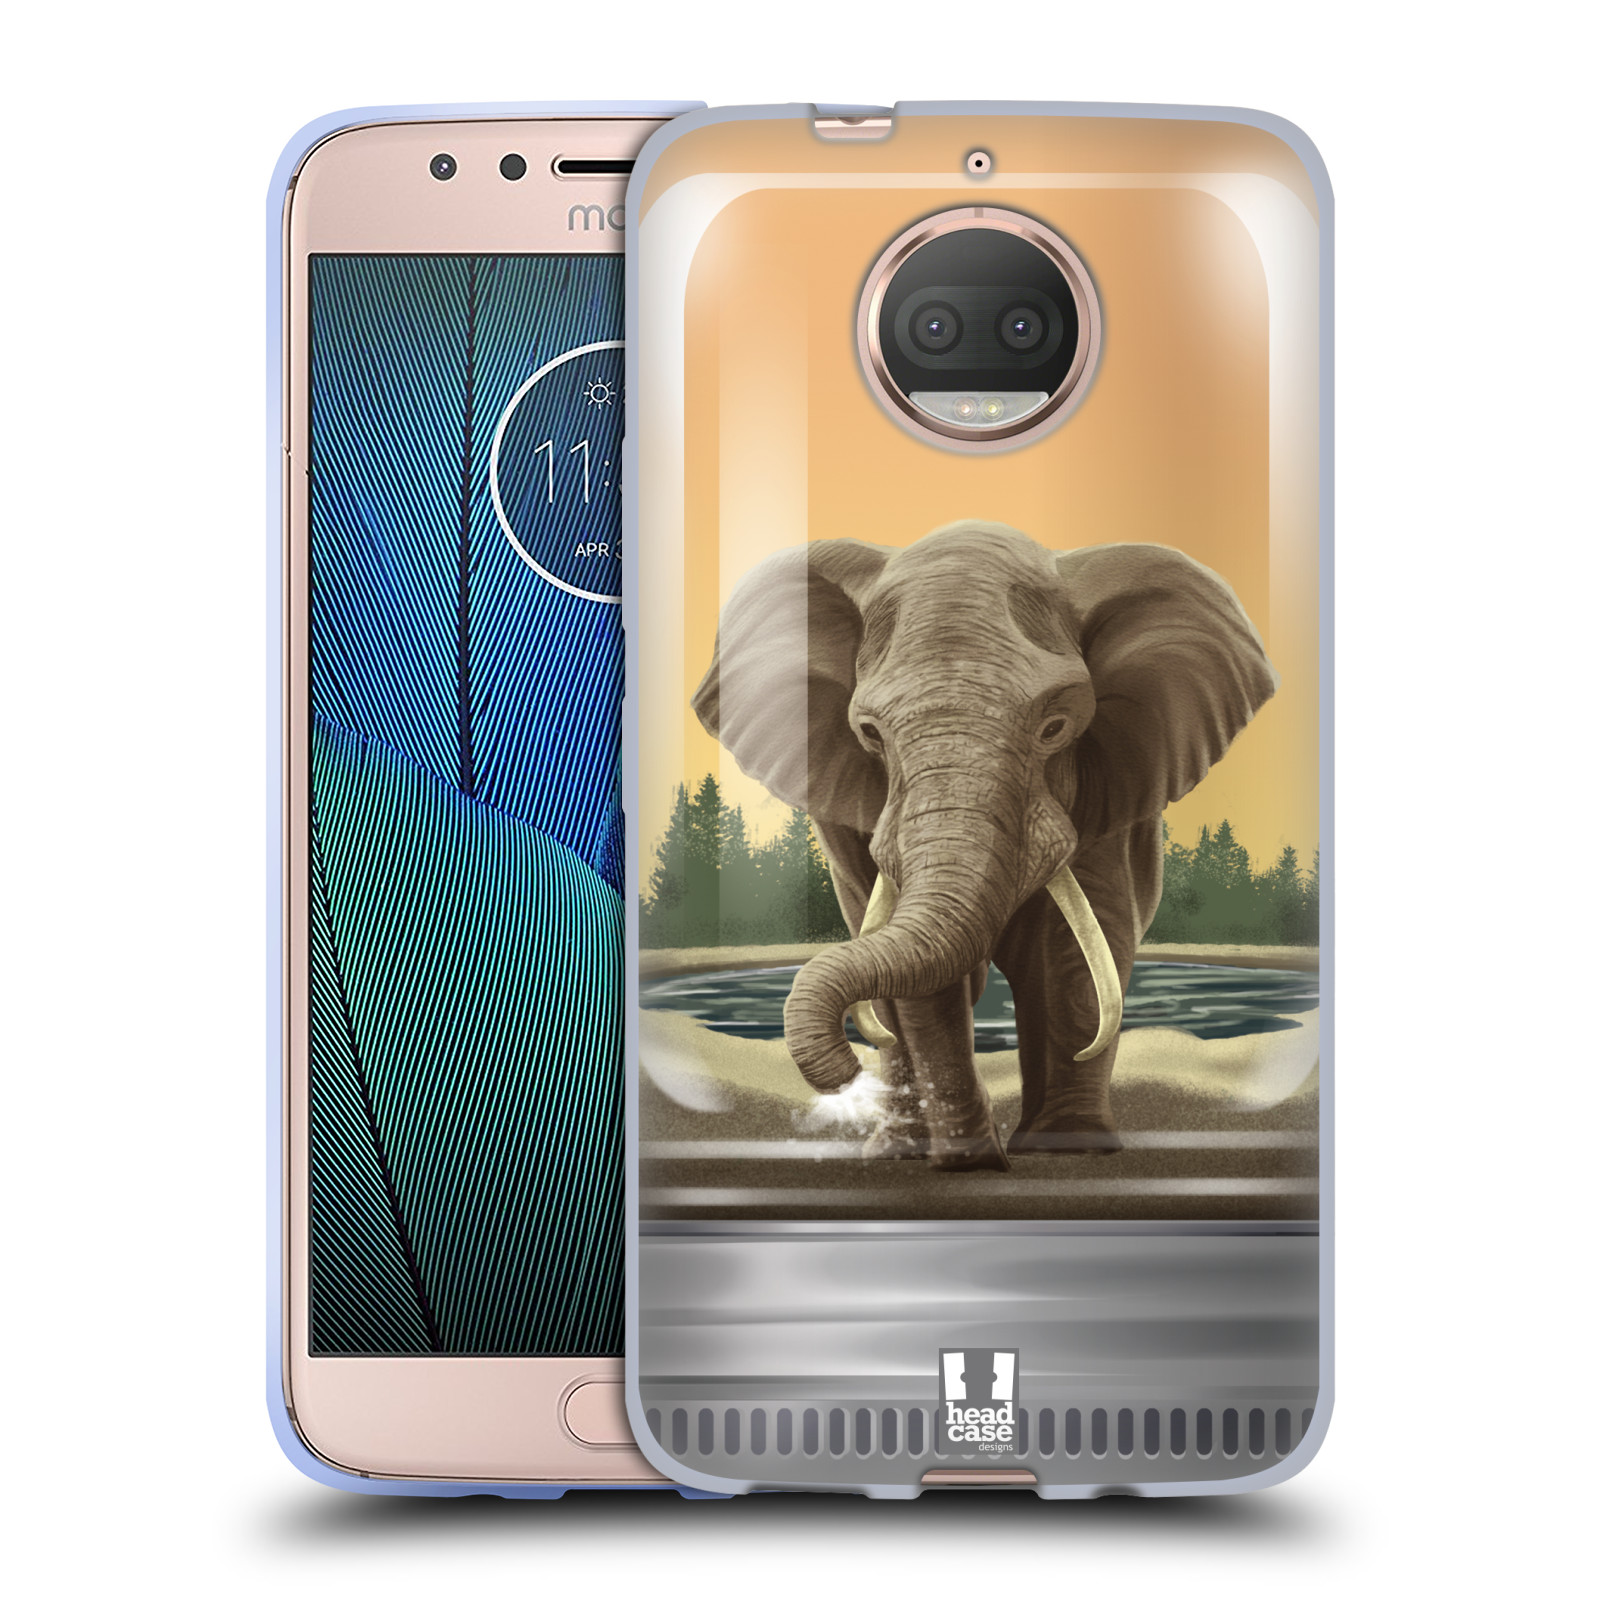 HEAD CASE silikonový obal na mobil Lenovo Moto G5s PLUS vzor Zvířátka v těžítku slon